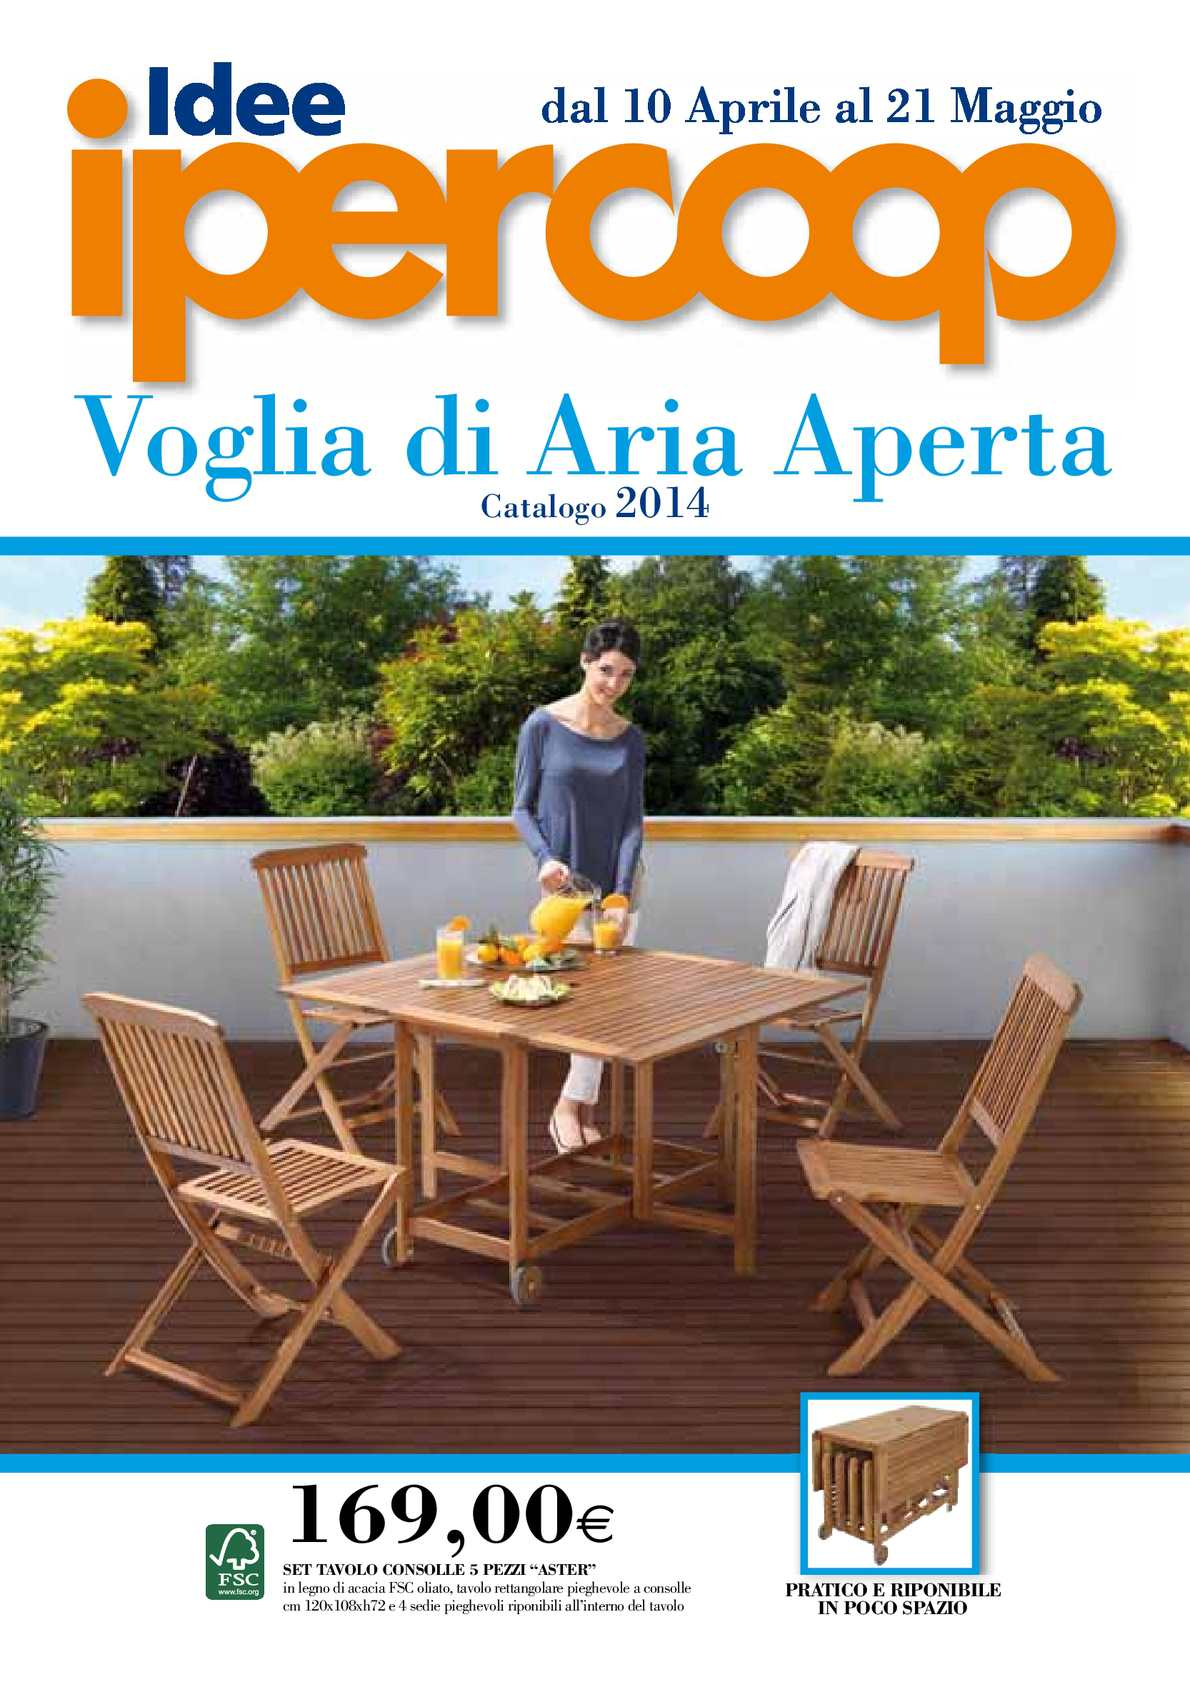 Calam o volantino coop giardino 10 apr 21 mag for Volantino mobili da giardino